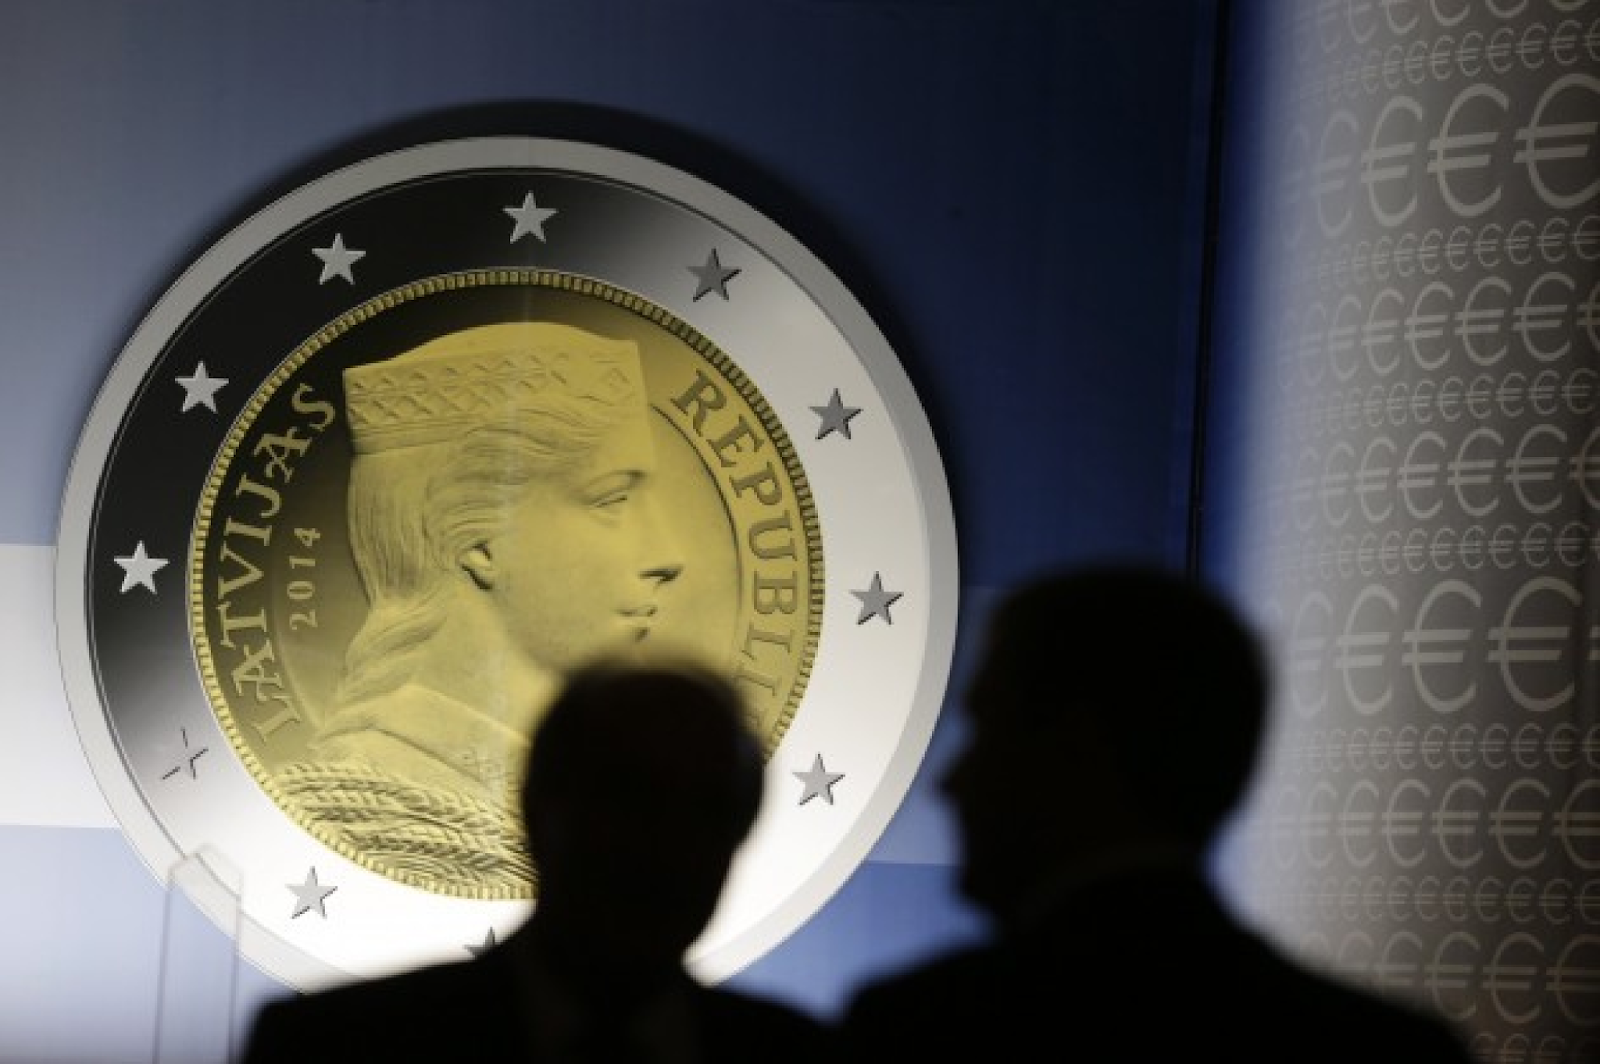 f148d6cef26 Γερμανία και ΕΚΤ εξαιρούν μόνο την Ελλάδα από την αγορά ομολόγων - Το